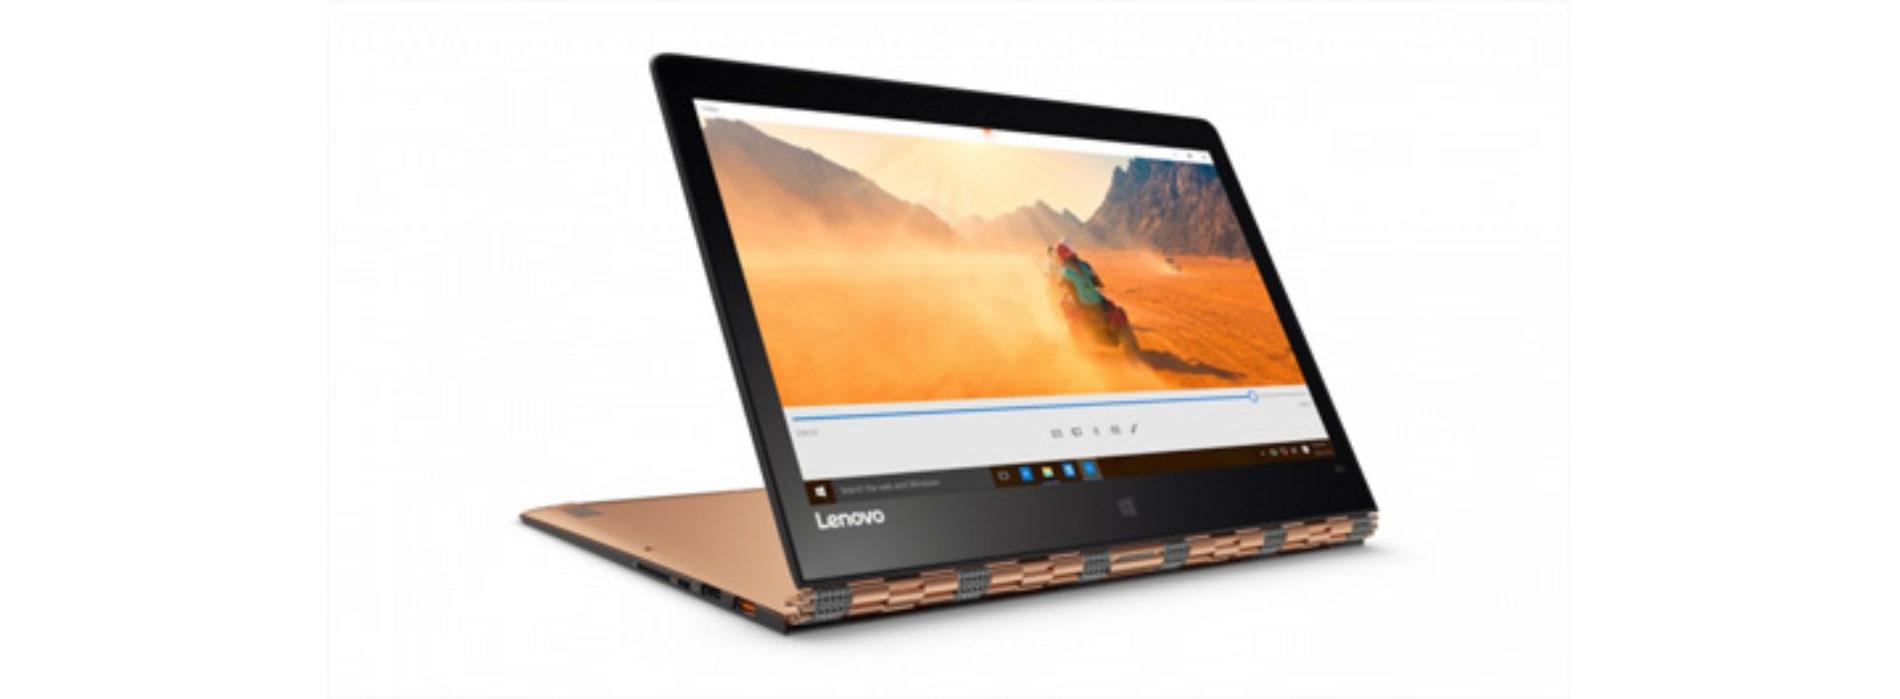 Ремонт ноутбуков Lenovo